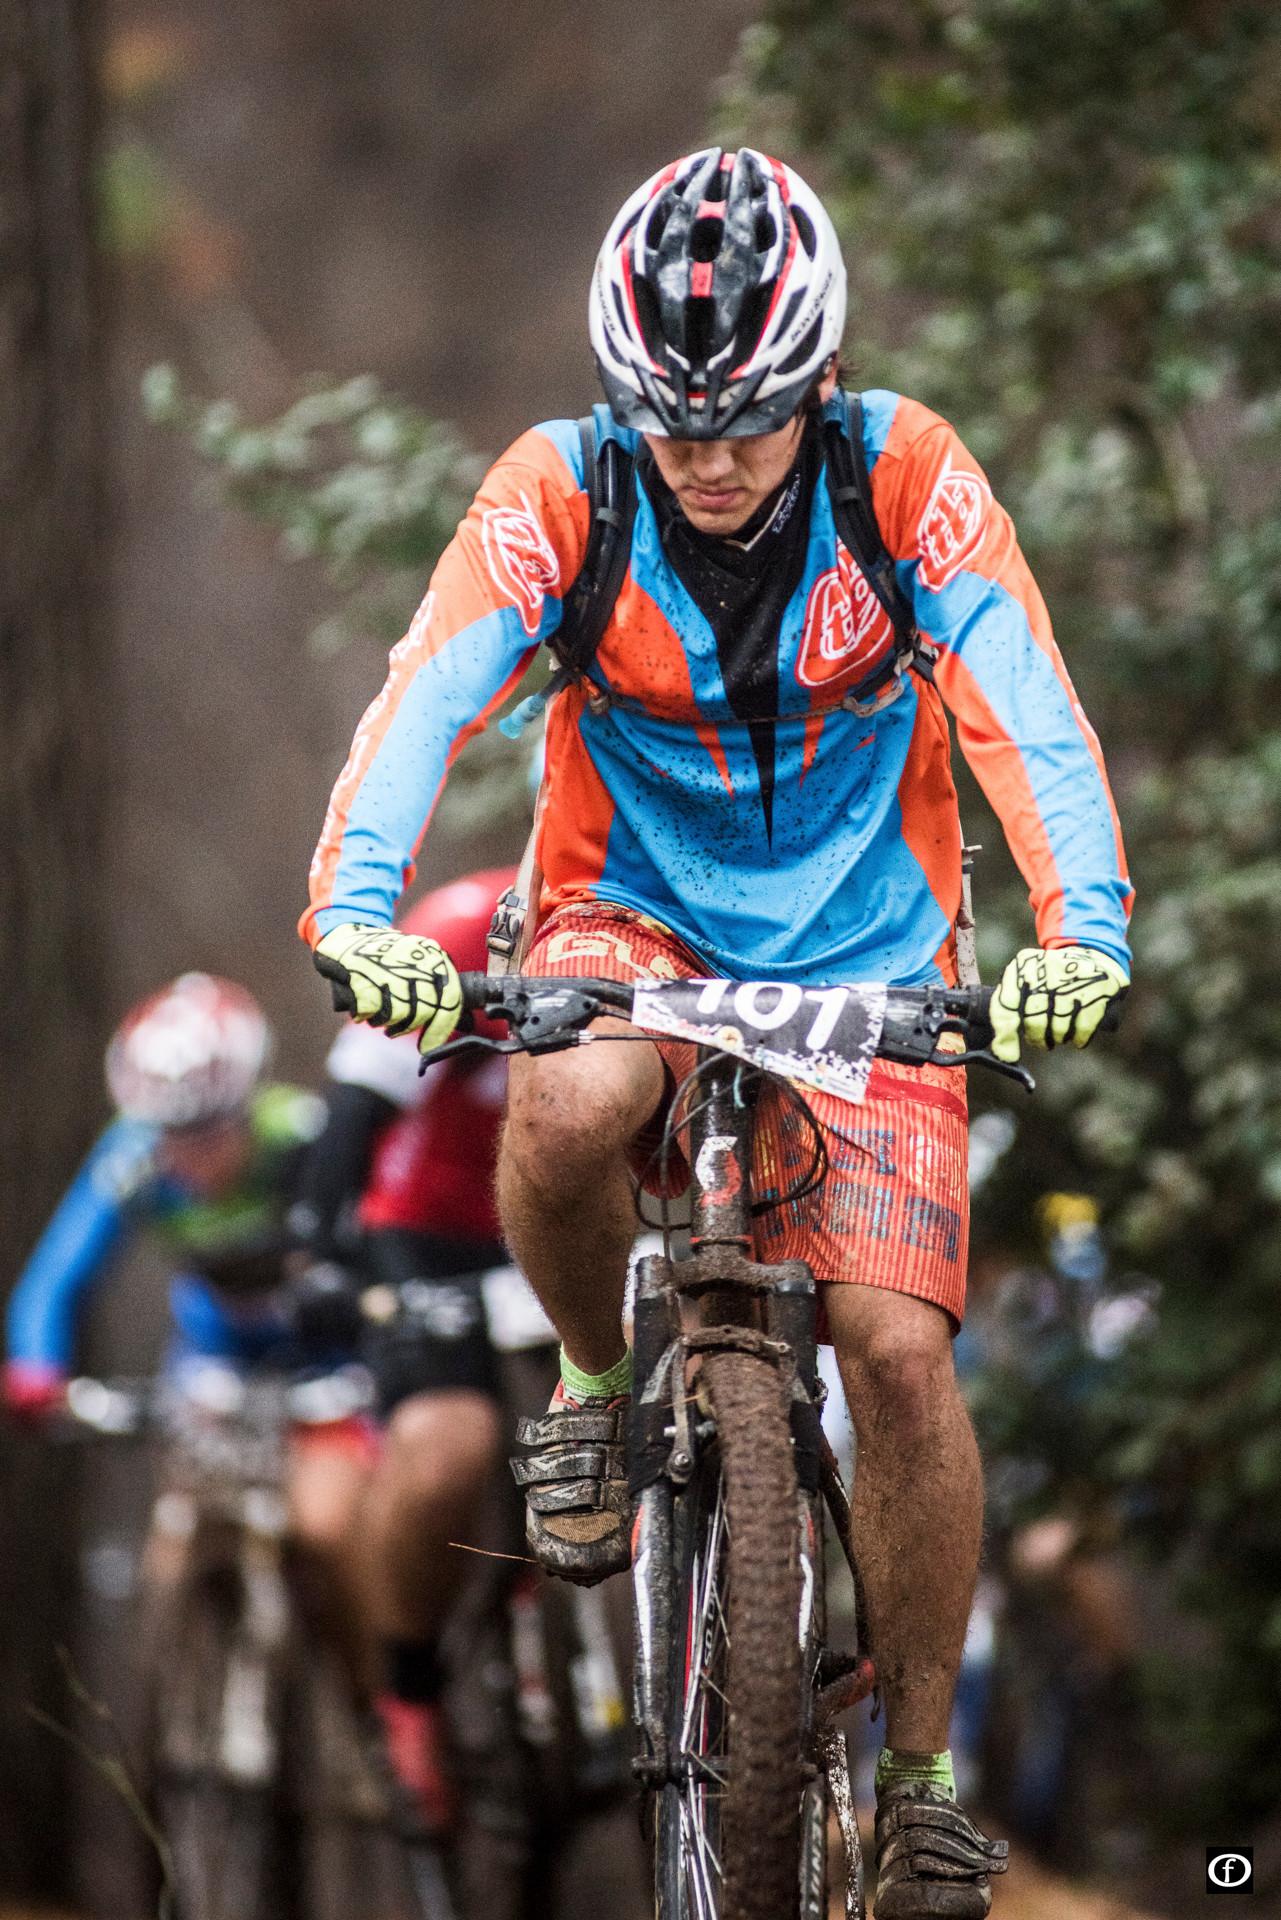 2015-05-17-Ciclismo Enduro-50.jpg